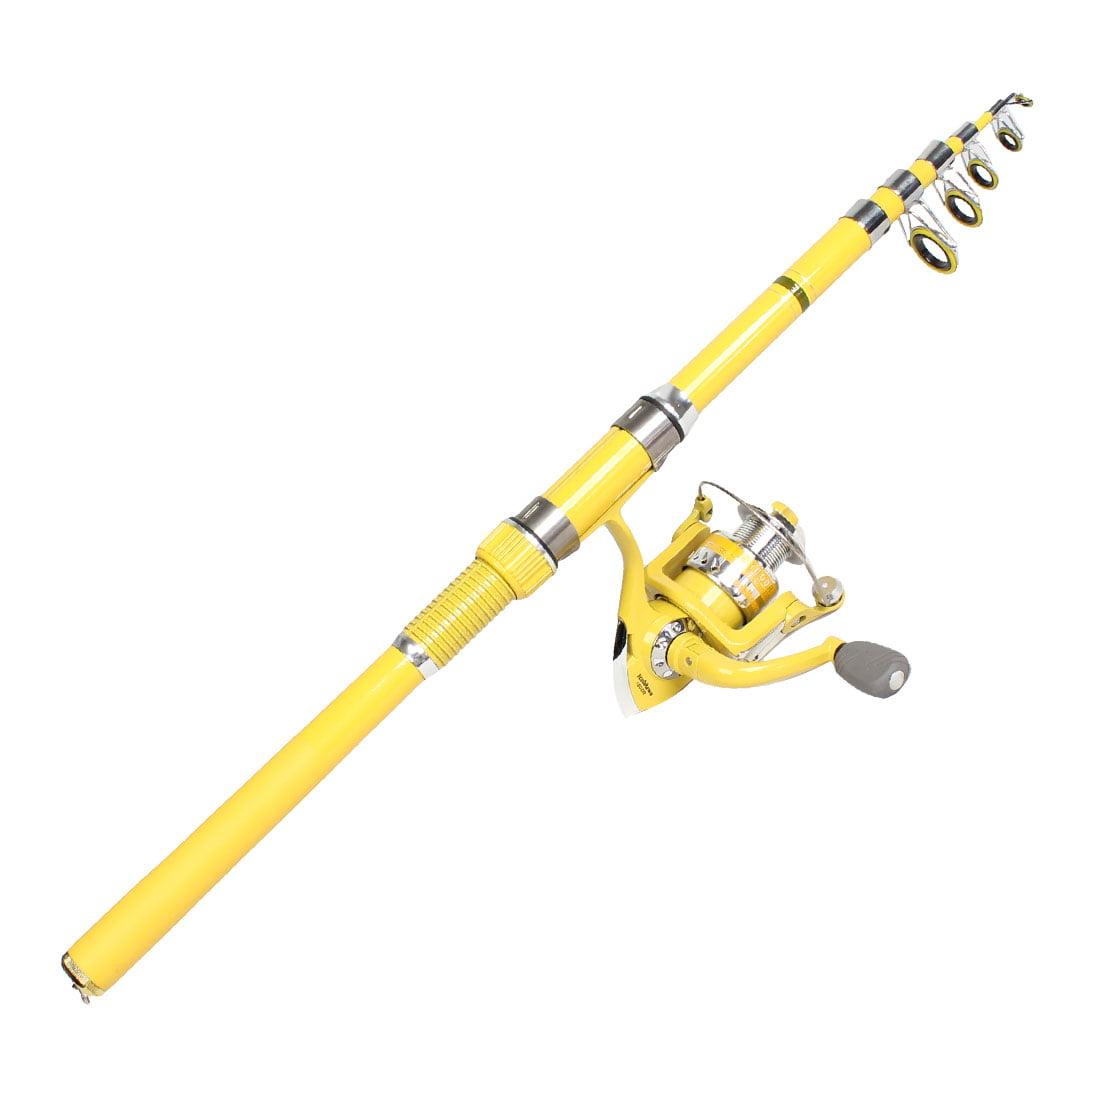 7 Fishhooks 6 Sections Telescopic Fishing Rod Pole Yellow